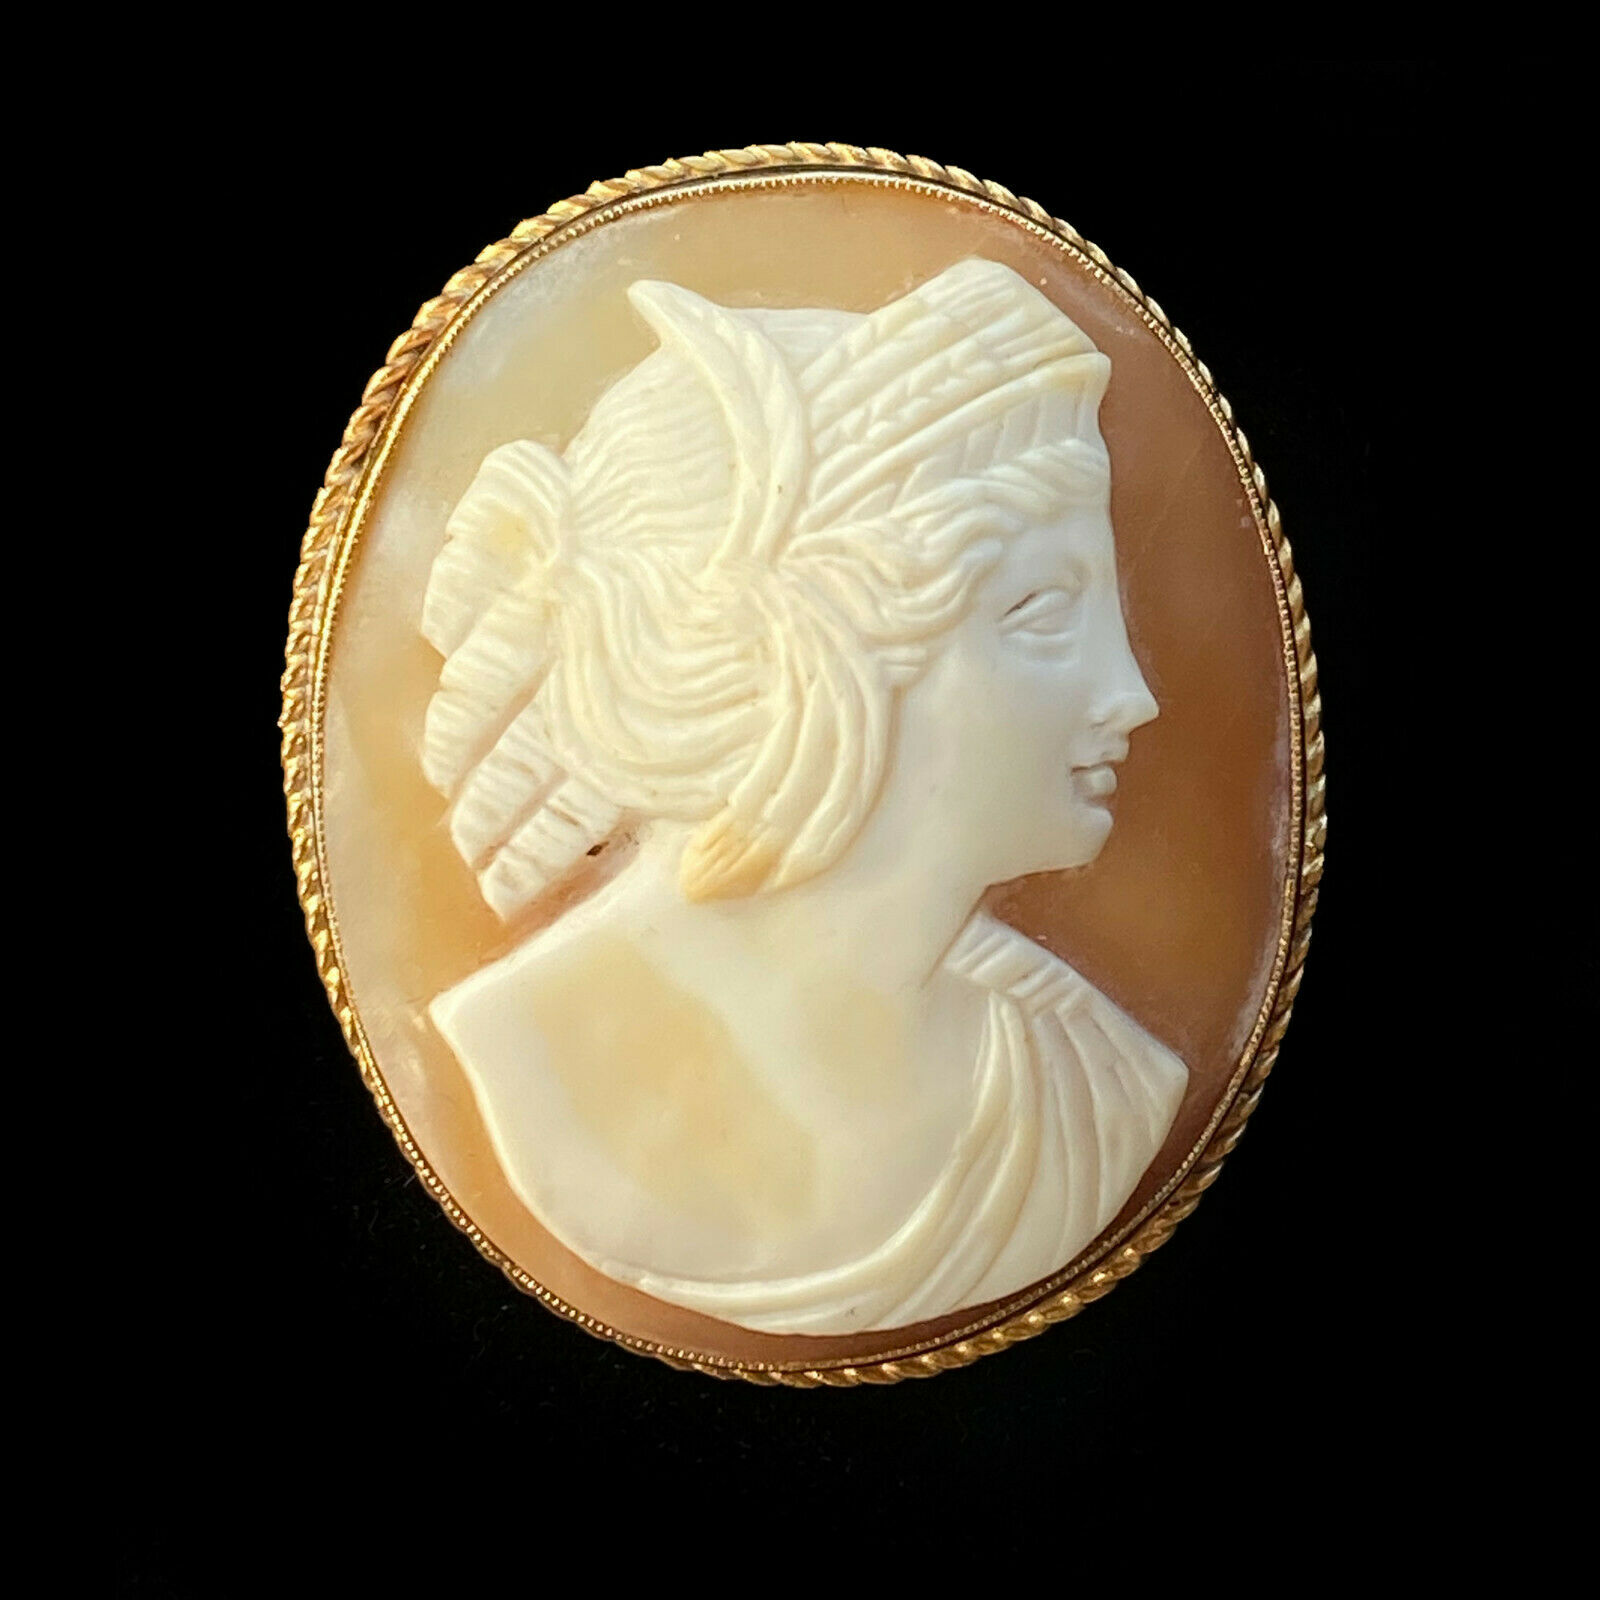 Antique 9ct, 9k, 375 Gold Goddess Hera Portrait Cameo Brooch, Circa 1910